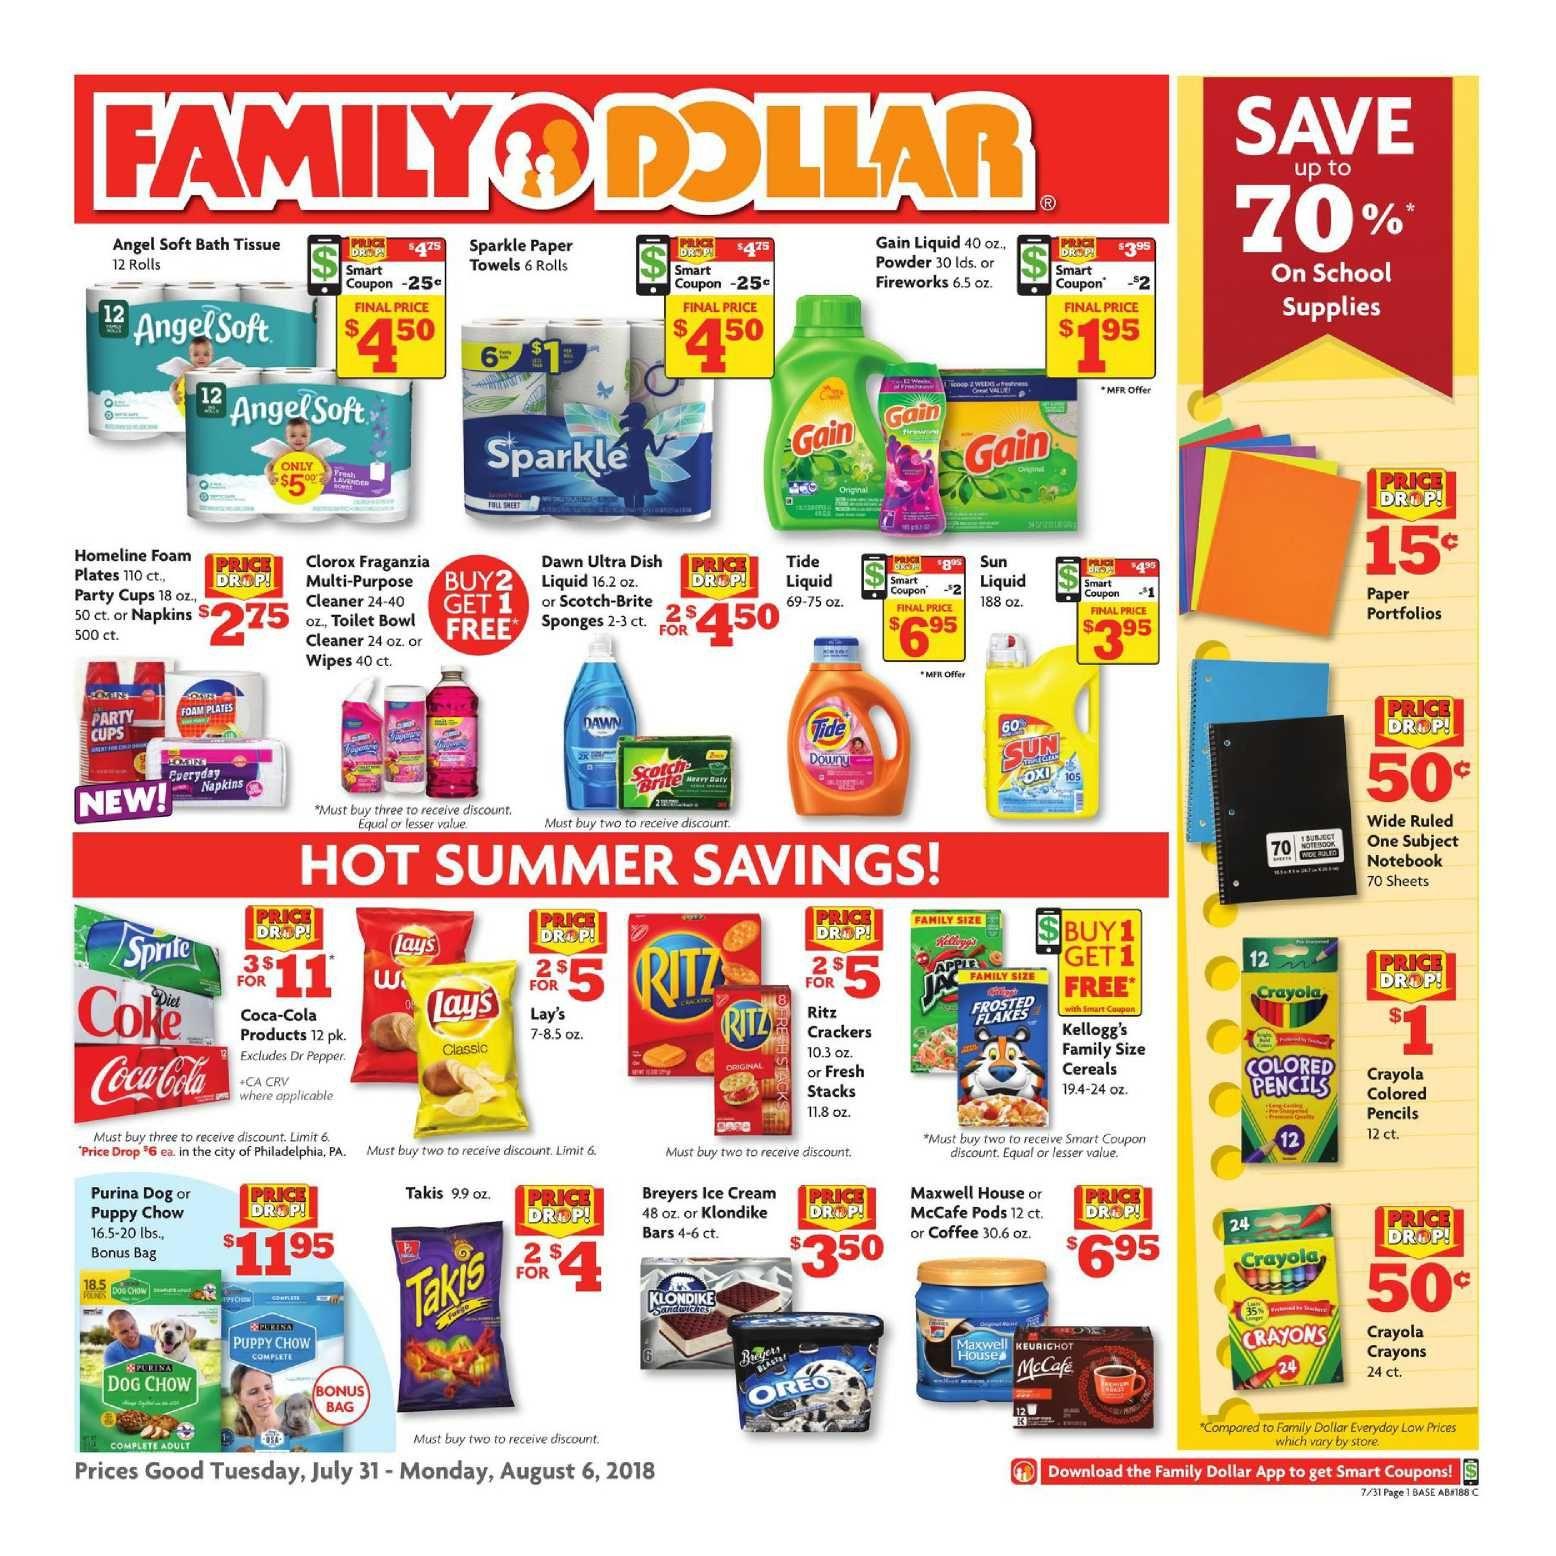 Family Dollar Weekly Ad Flyer December 31 2018 January 29 2019 Weeklyad123 Com Weekly Ad Circular Grocery Stores Family Dollar Weekly Ads Flyer